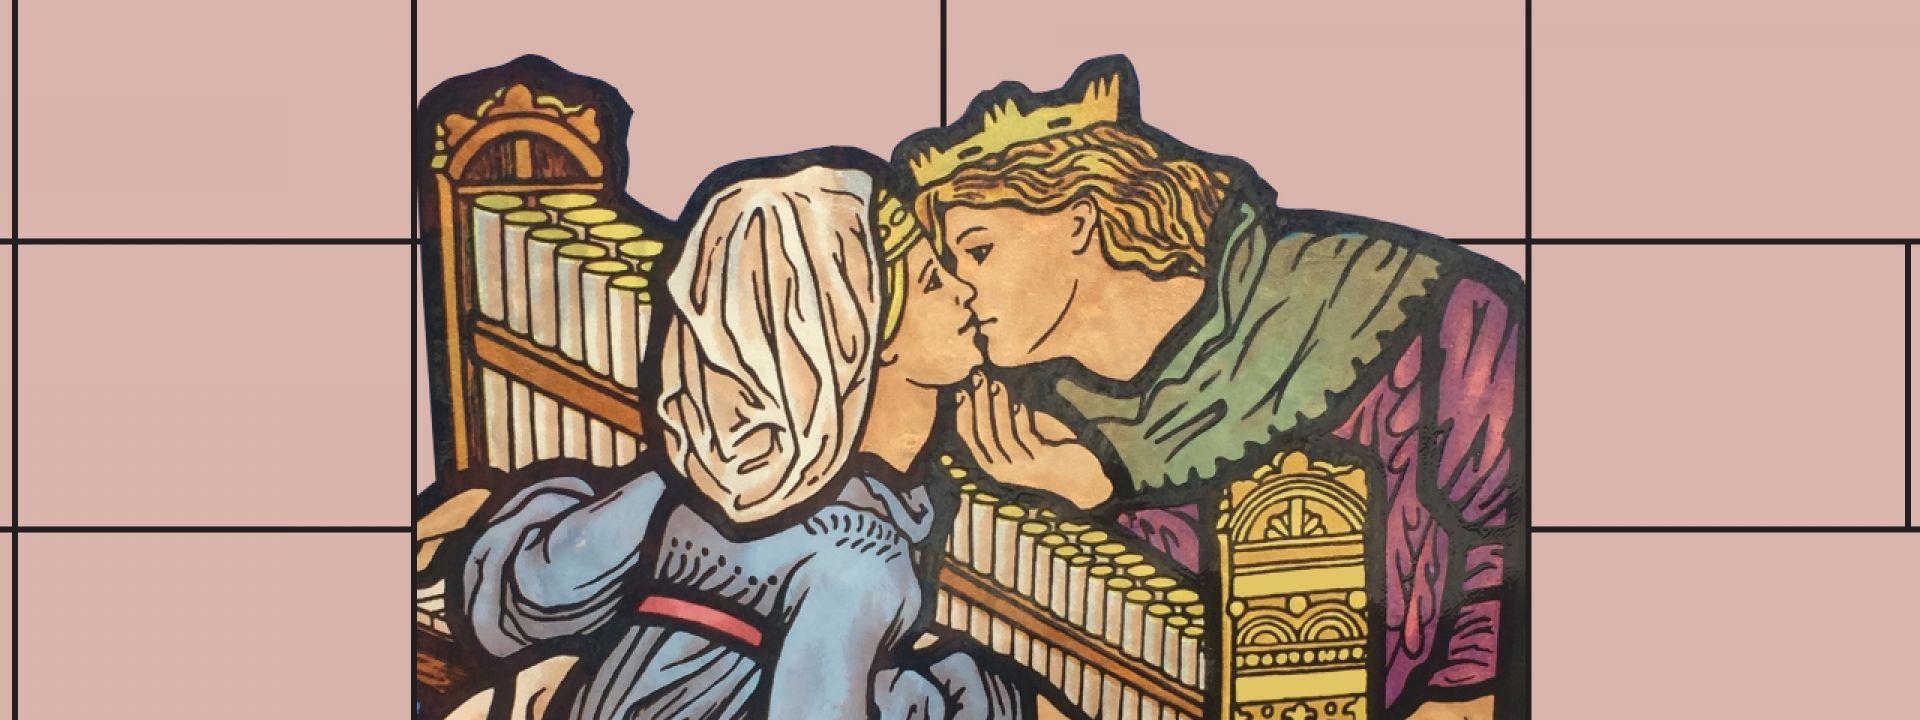 Orchestra of the Age of Enlightenment & Magdalena Kožená: Love & Duty - Εικόνα